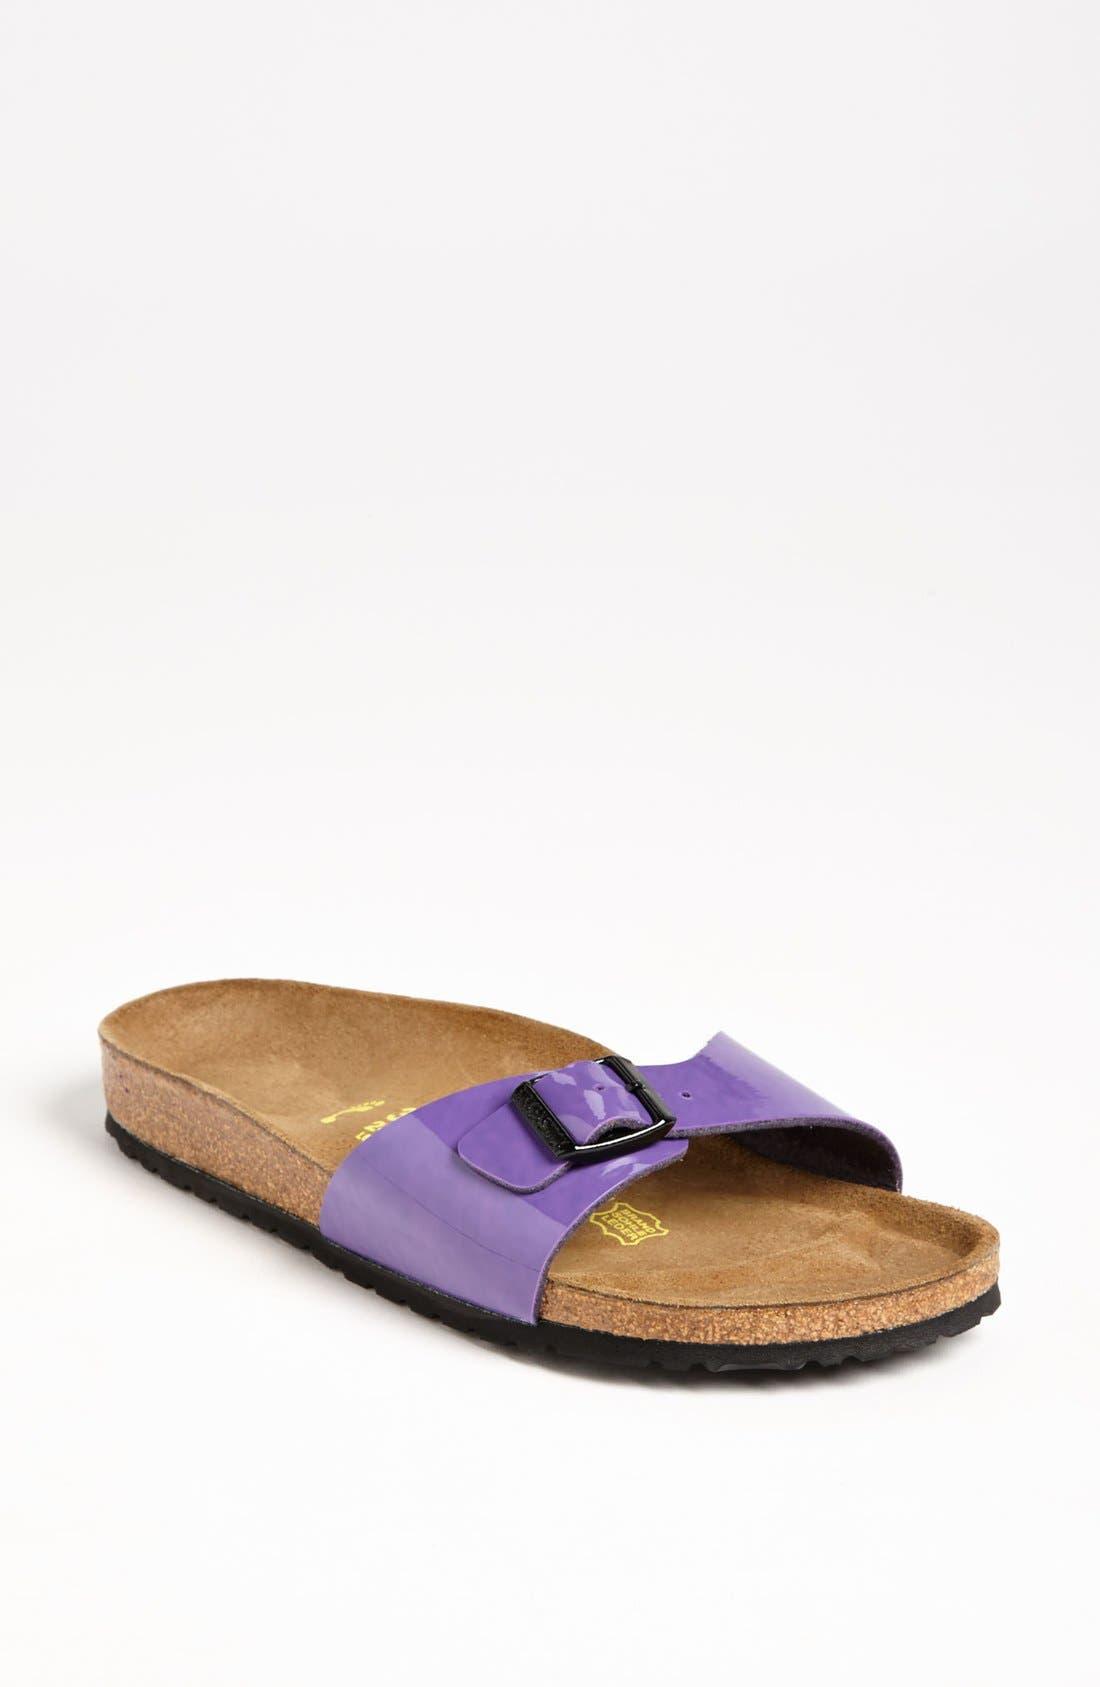 Main Image - Birkenstock 'Madrid' Birko-Flor™ Sandal (Women)